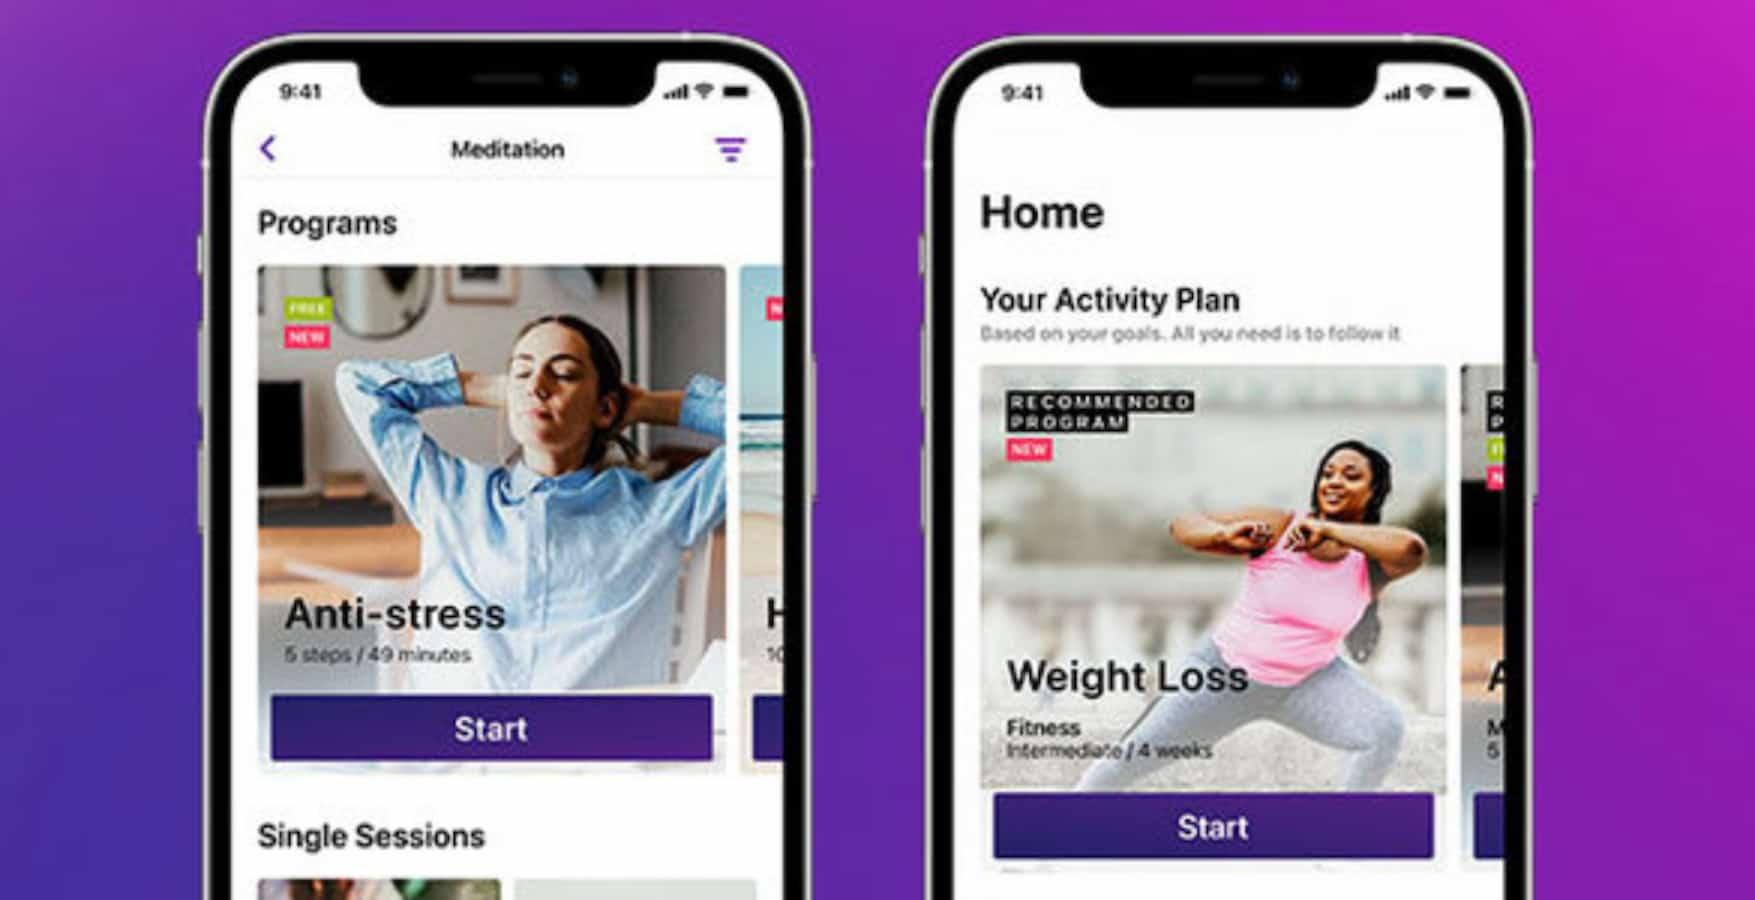 verve workout app